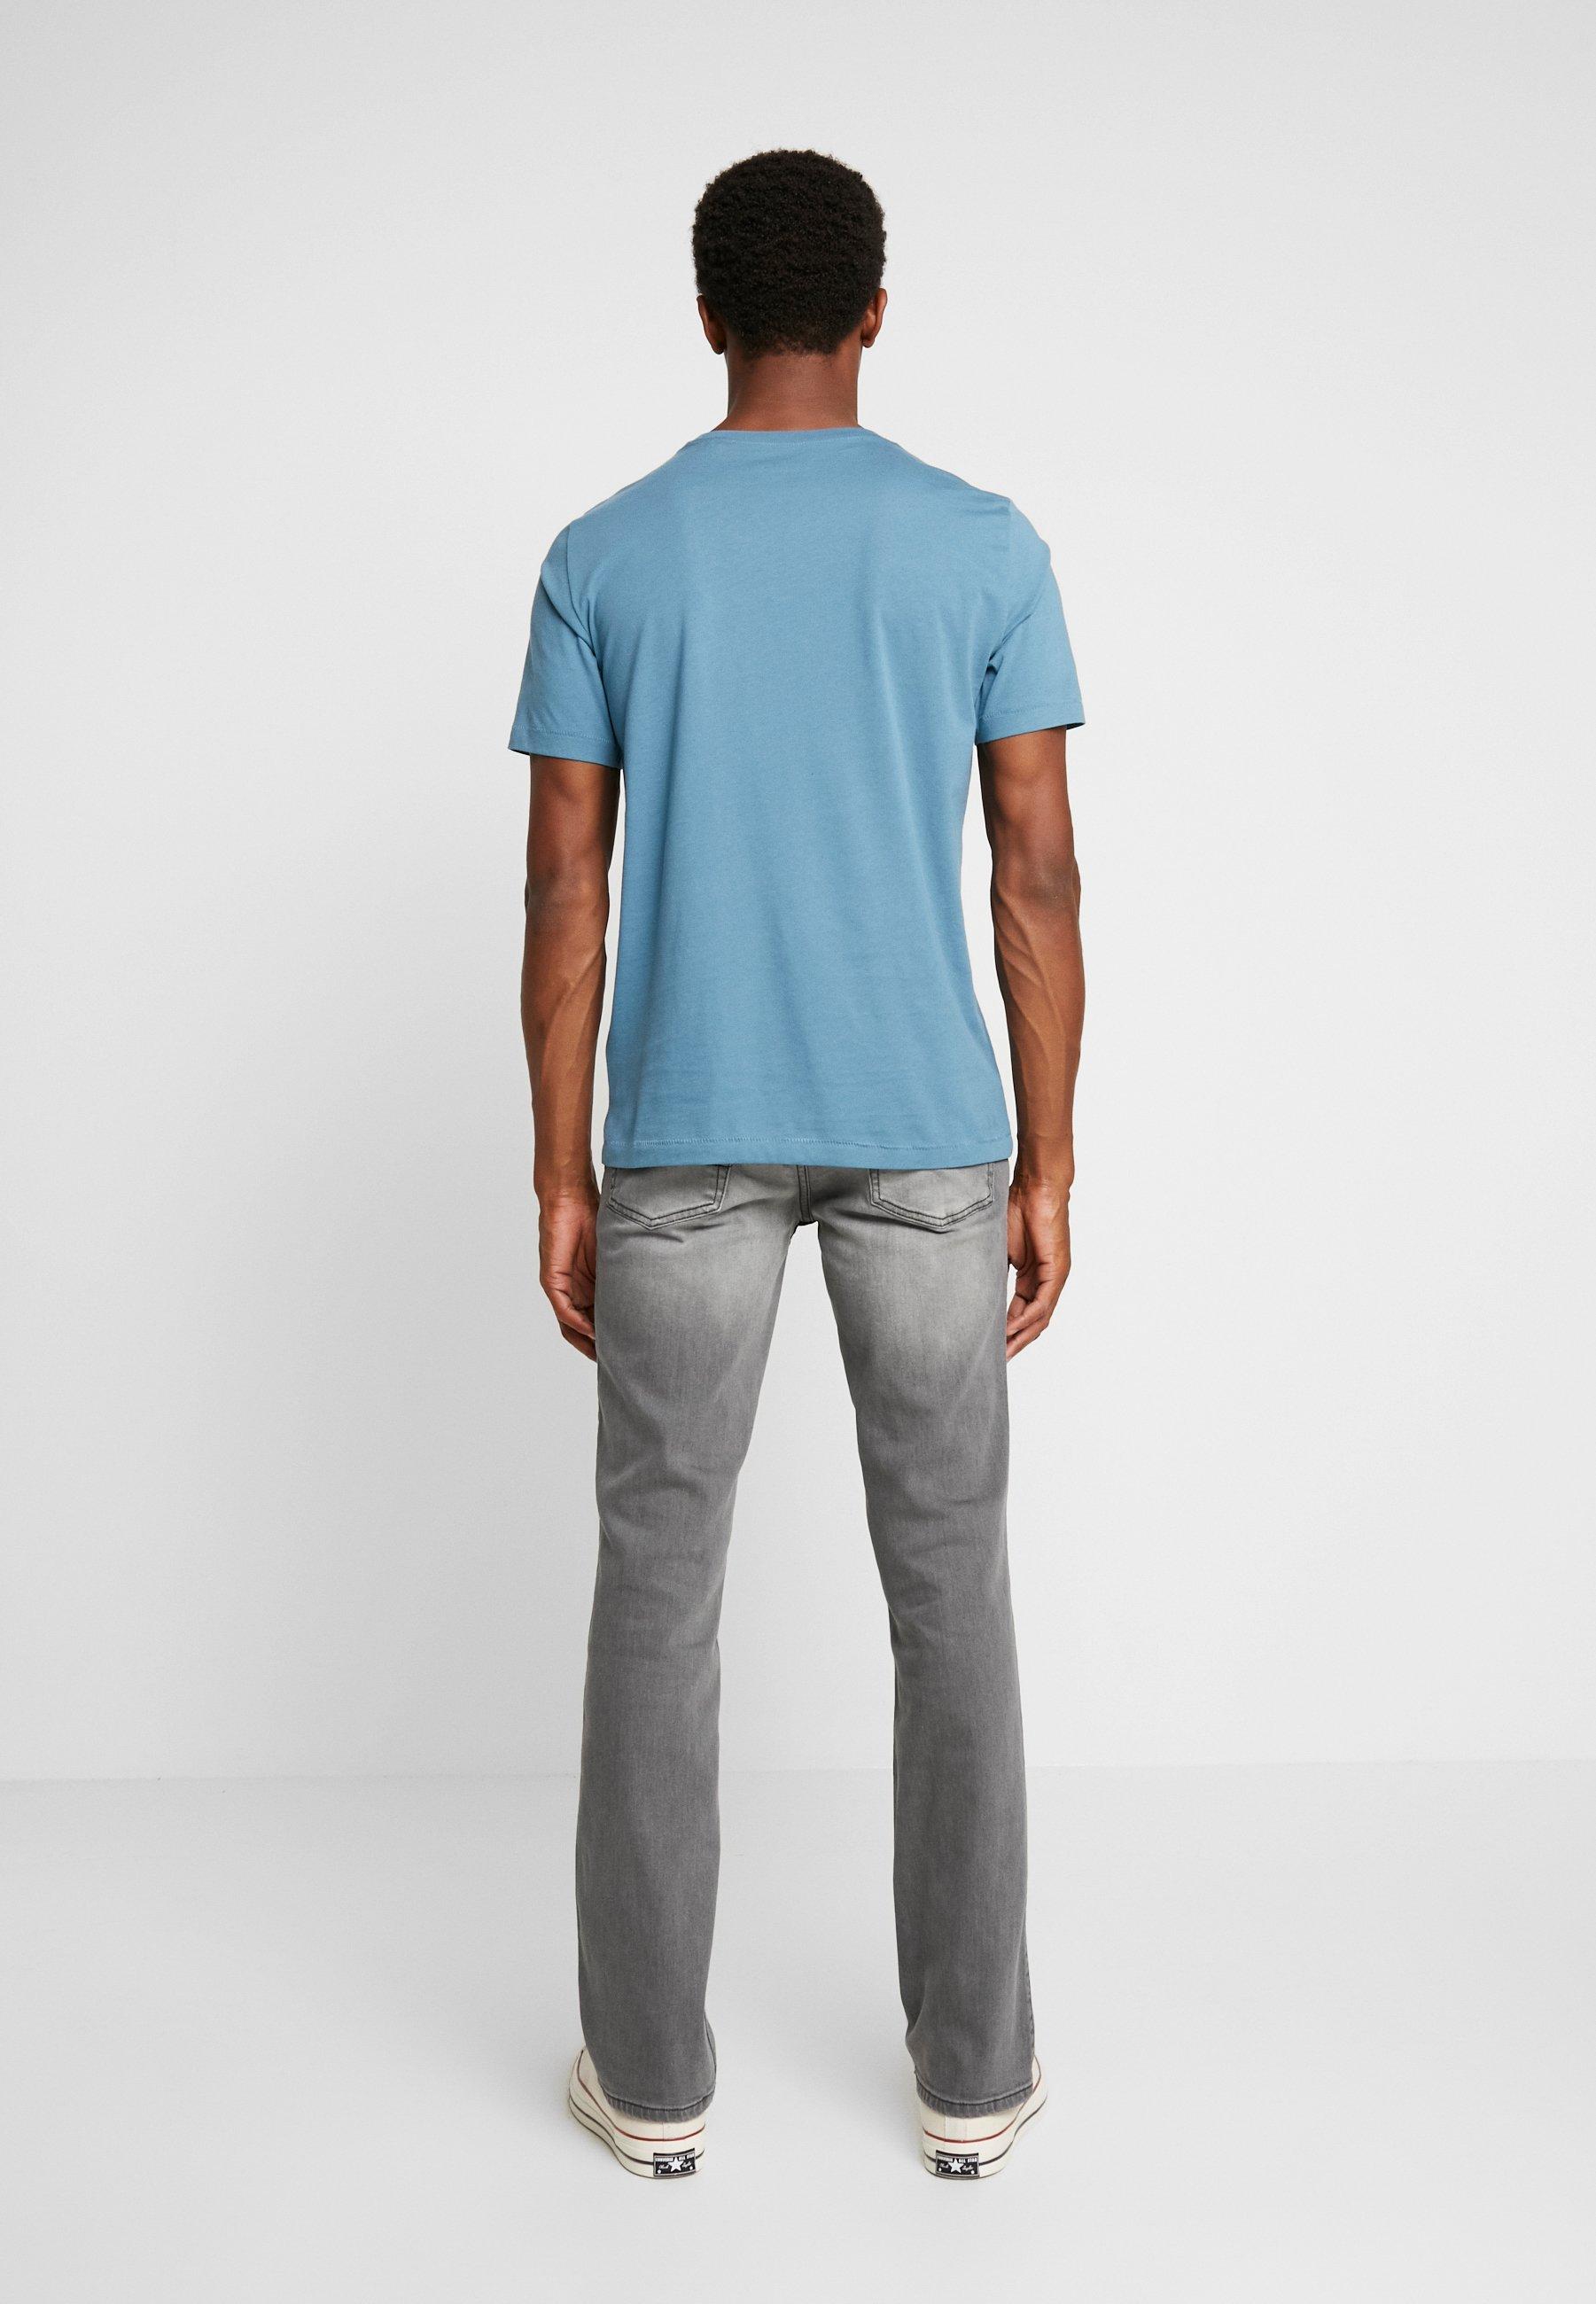 Mustang Blue AlexT Aegean Imprimé shirt 6vyY7bgIf